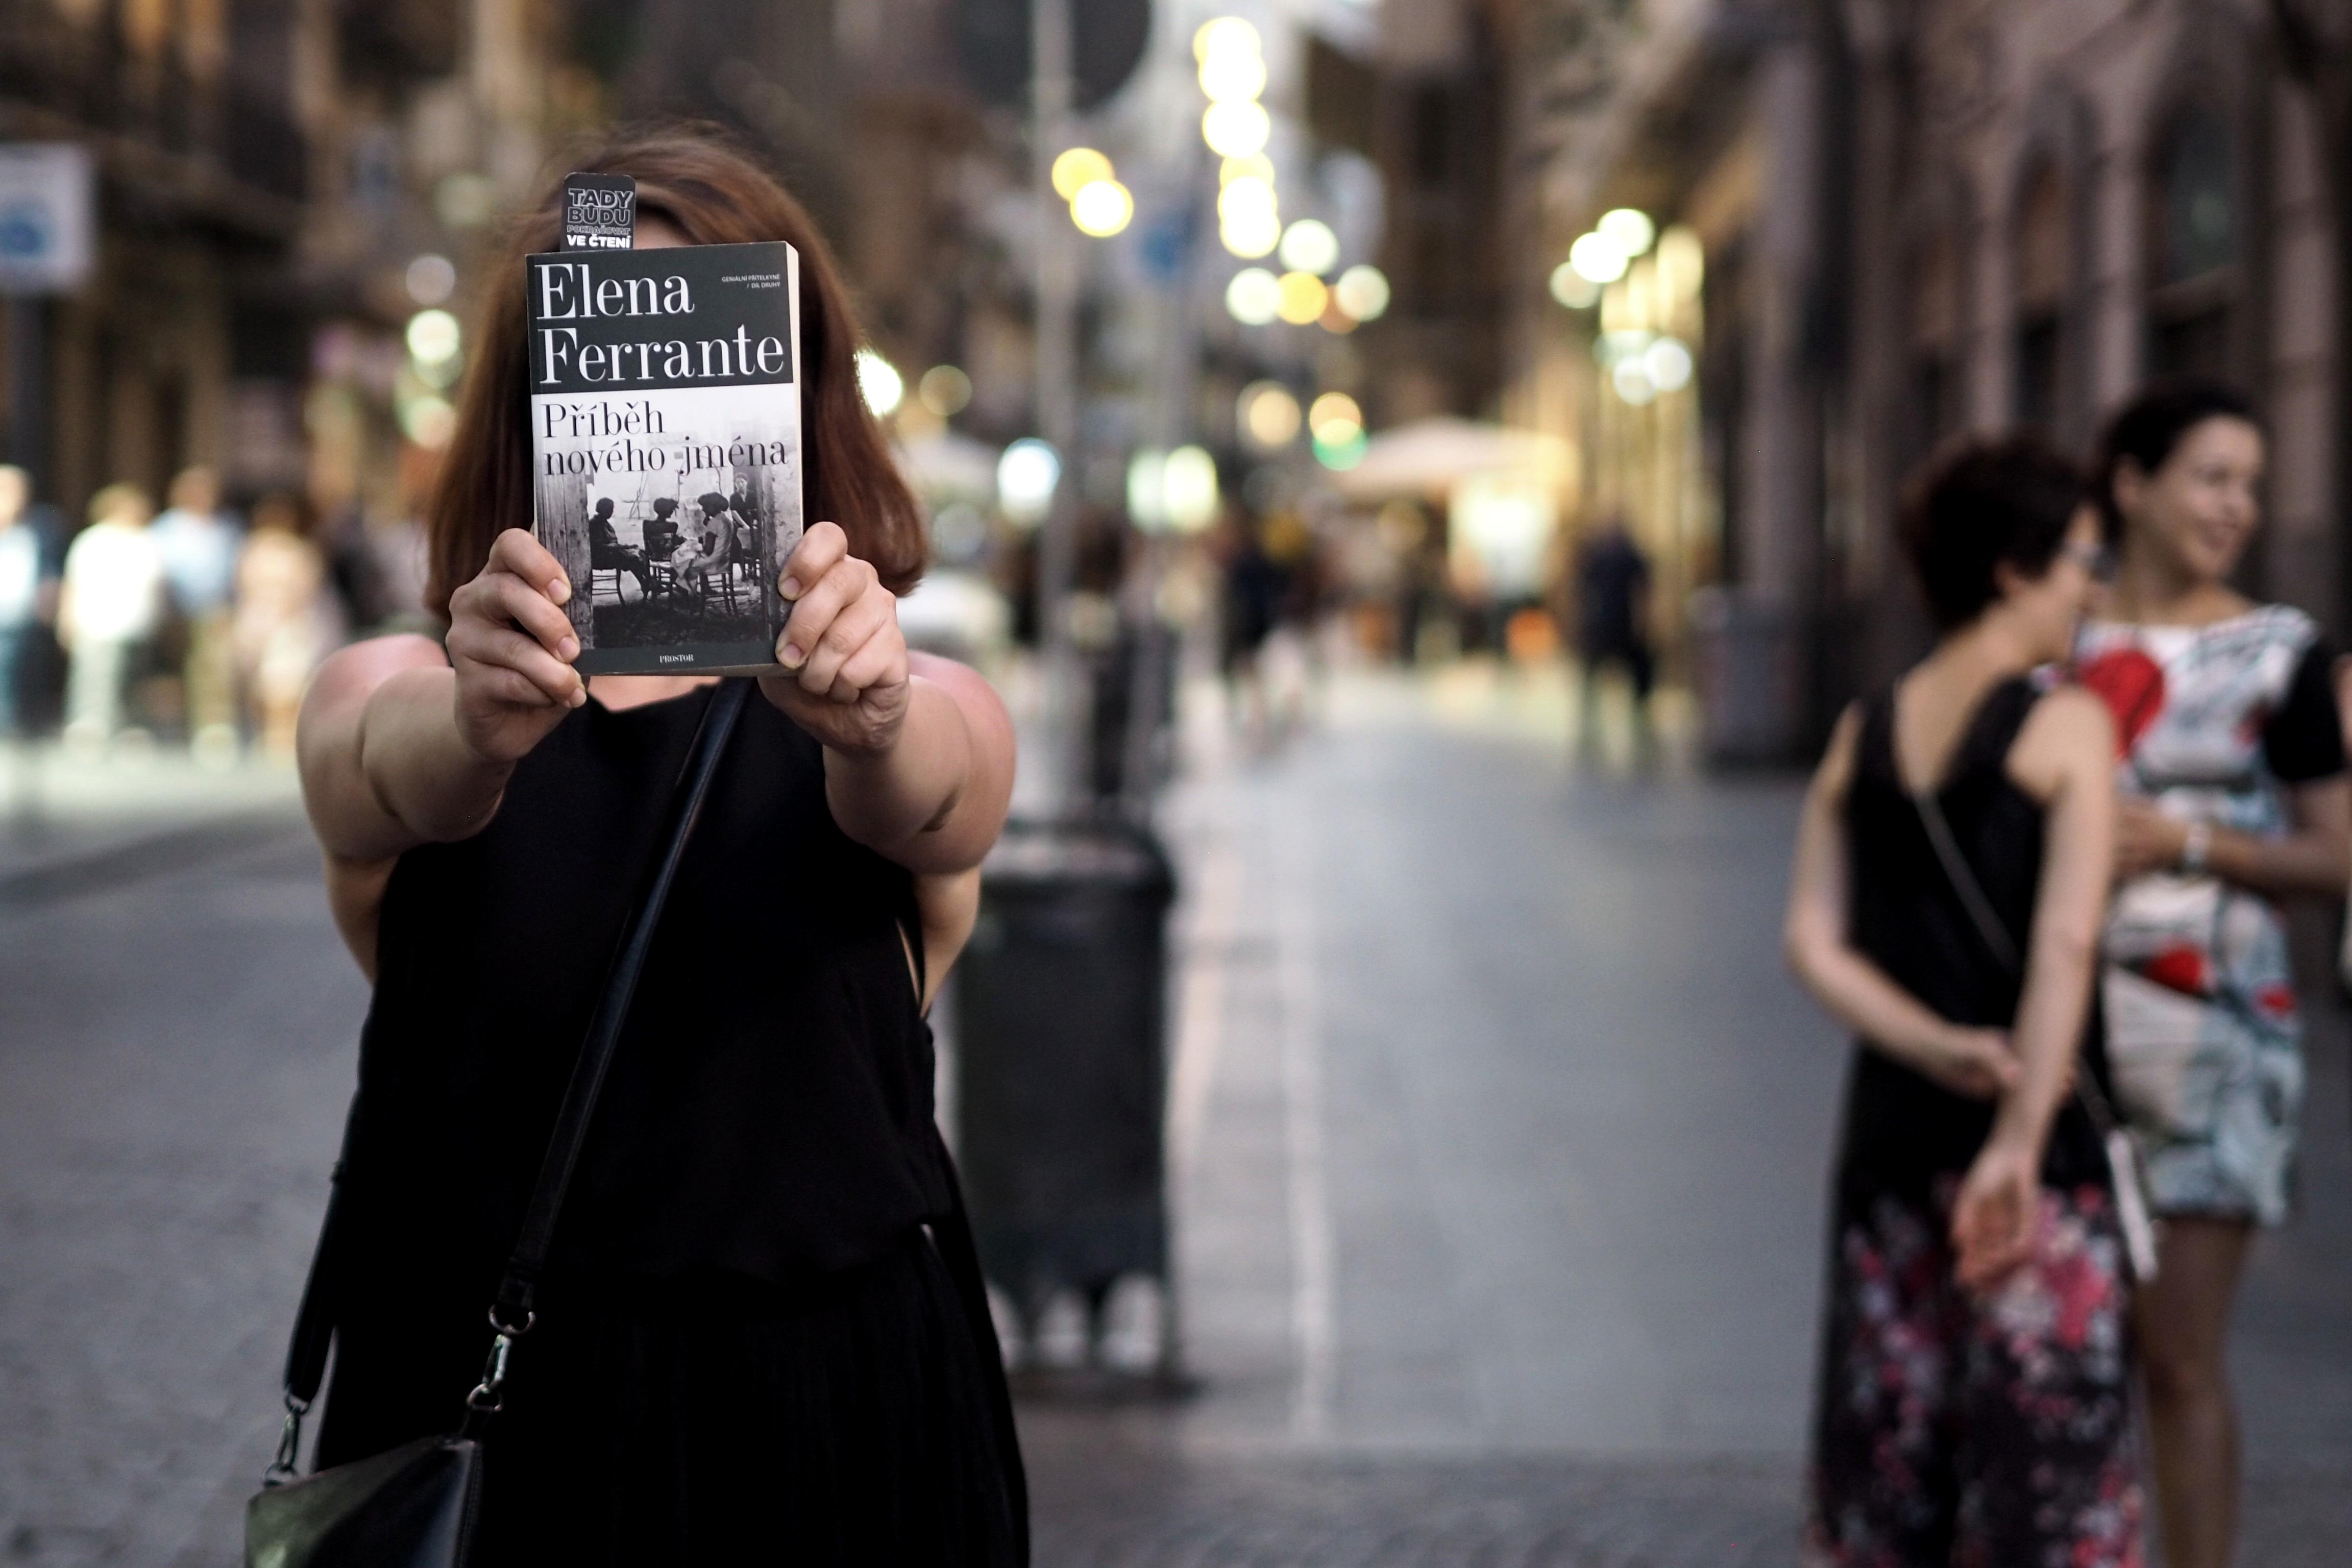 Neodolatelná Neapol očima Eleny Ferrante už podruhé